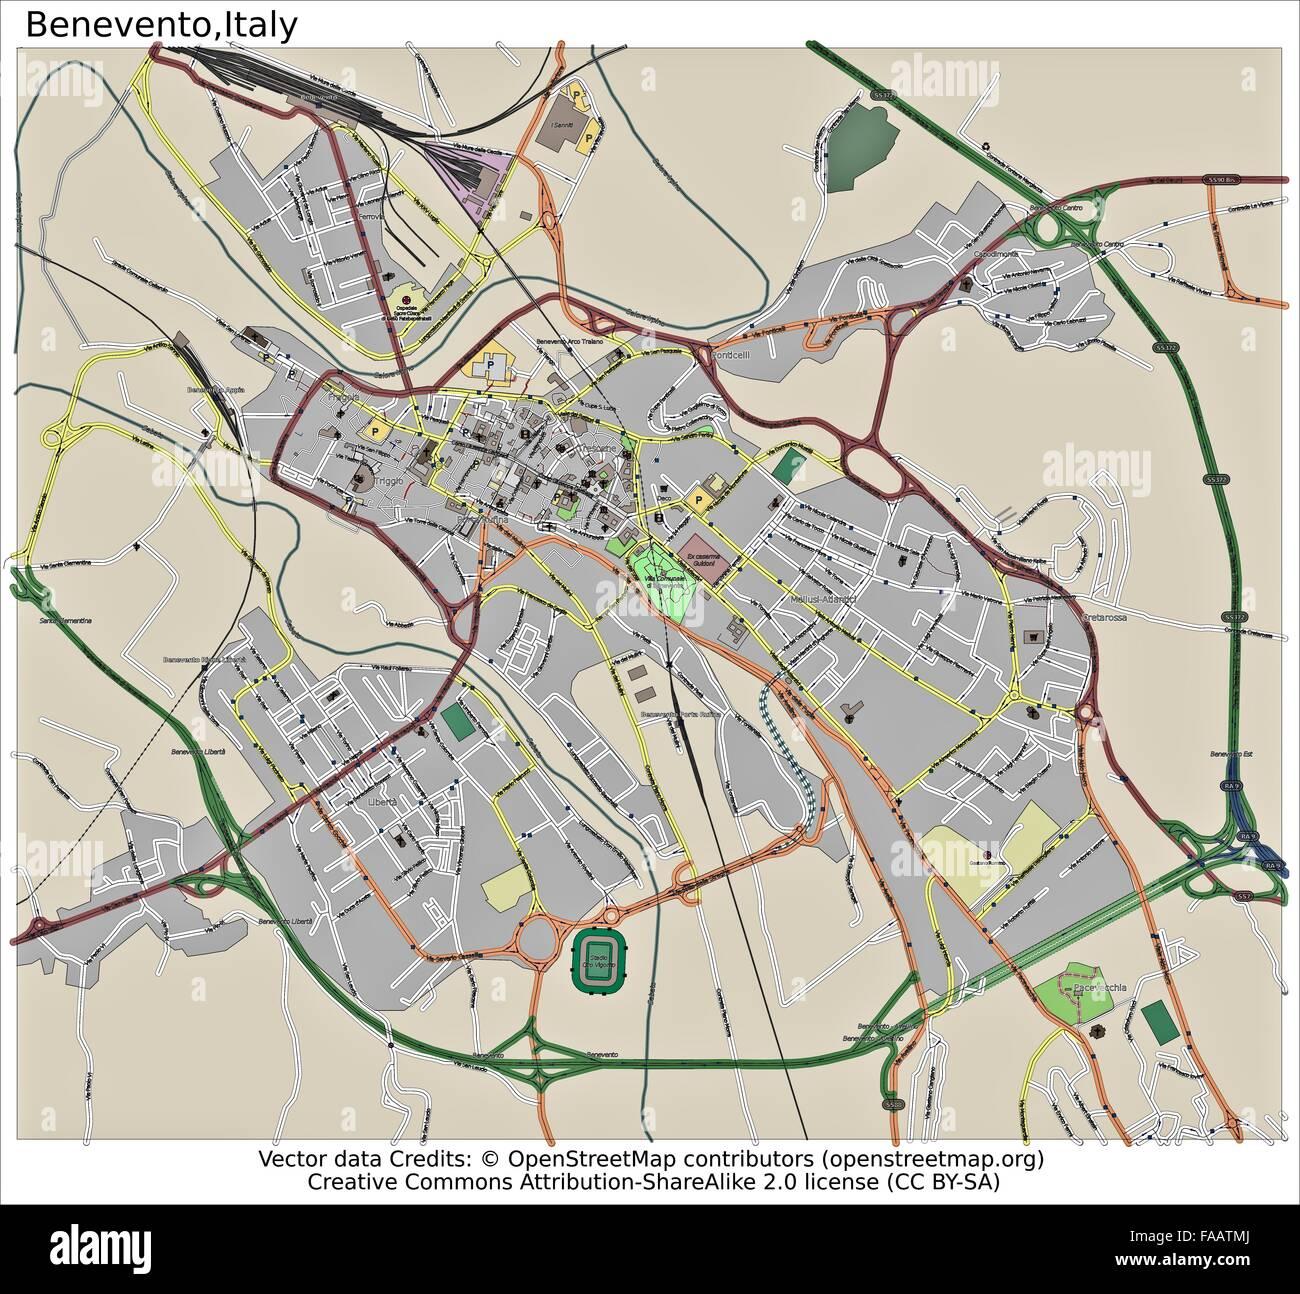 Benevento Italy city map Stock Photo 92437314 Alamy